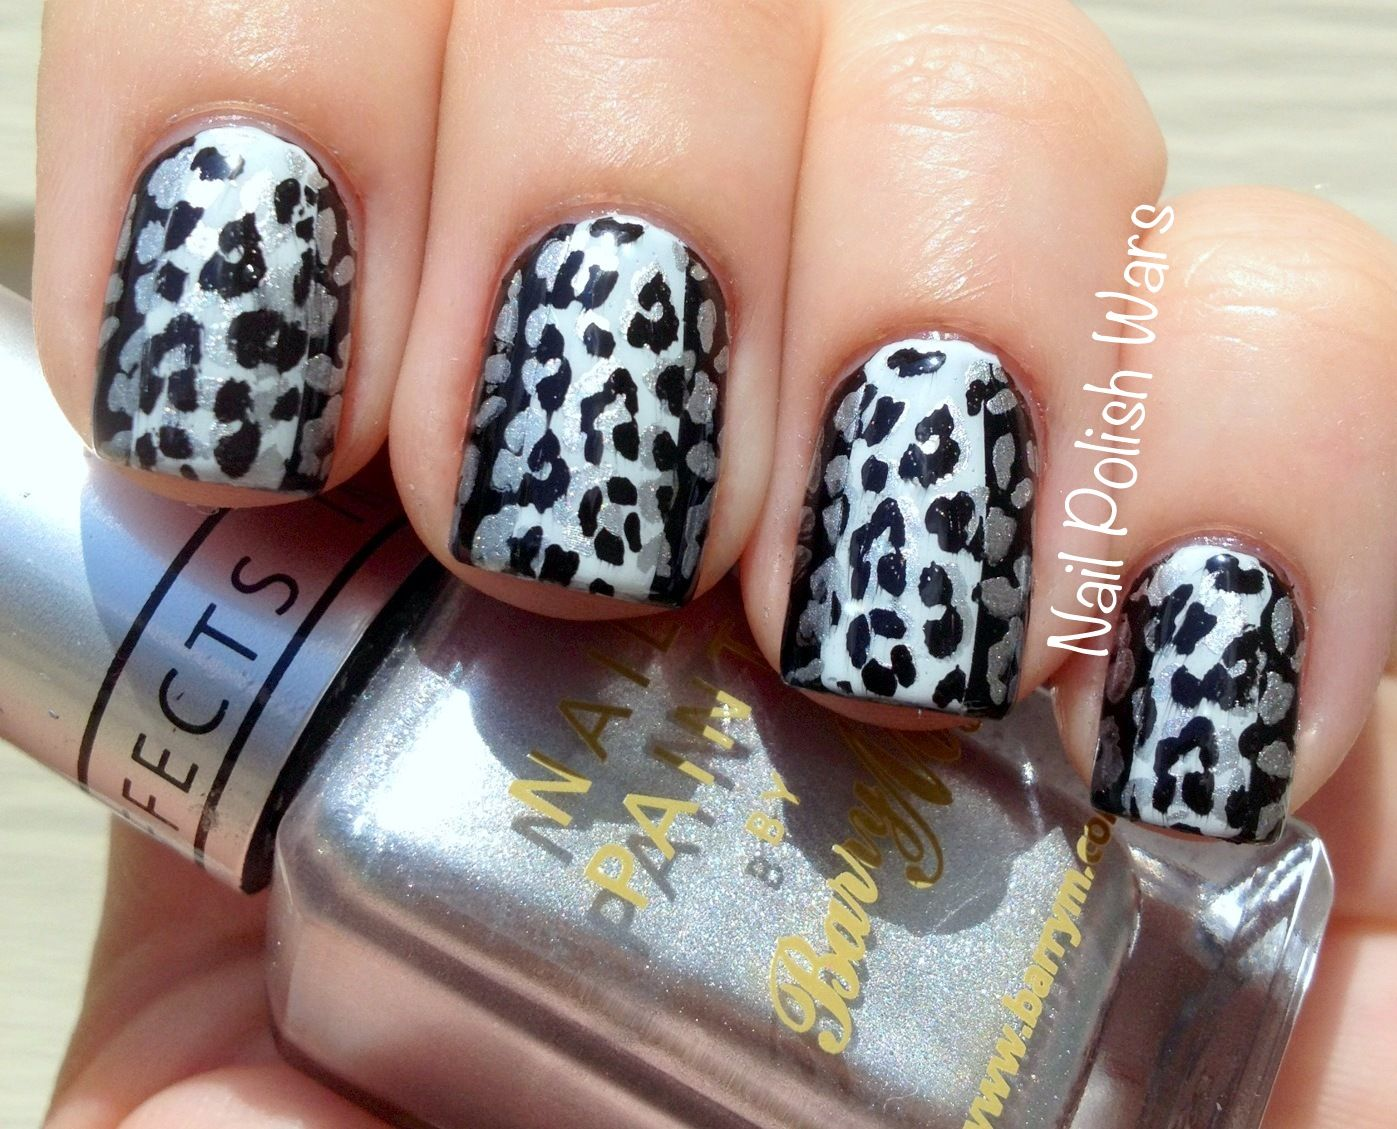 Nail Polish Wars: Lovely Leopard